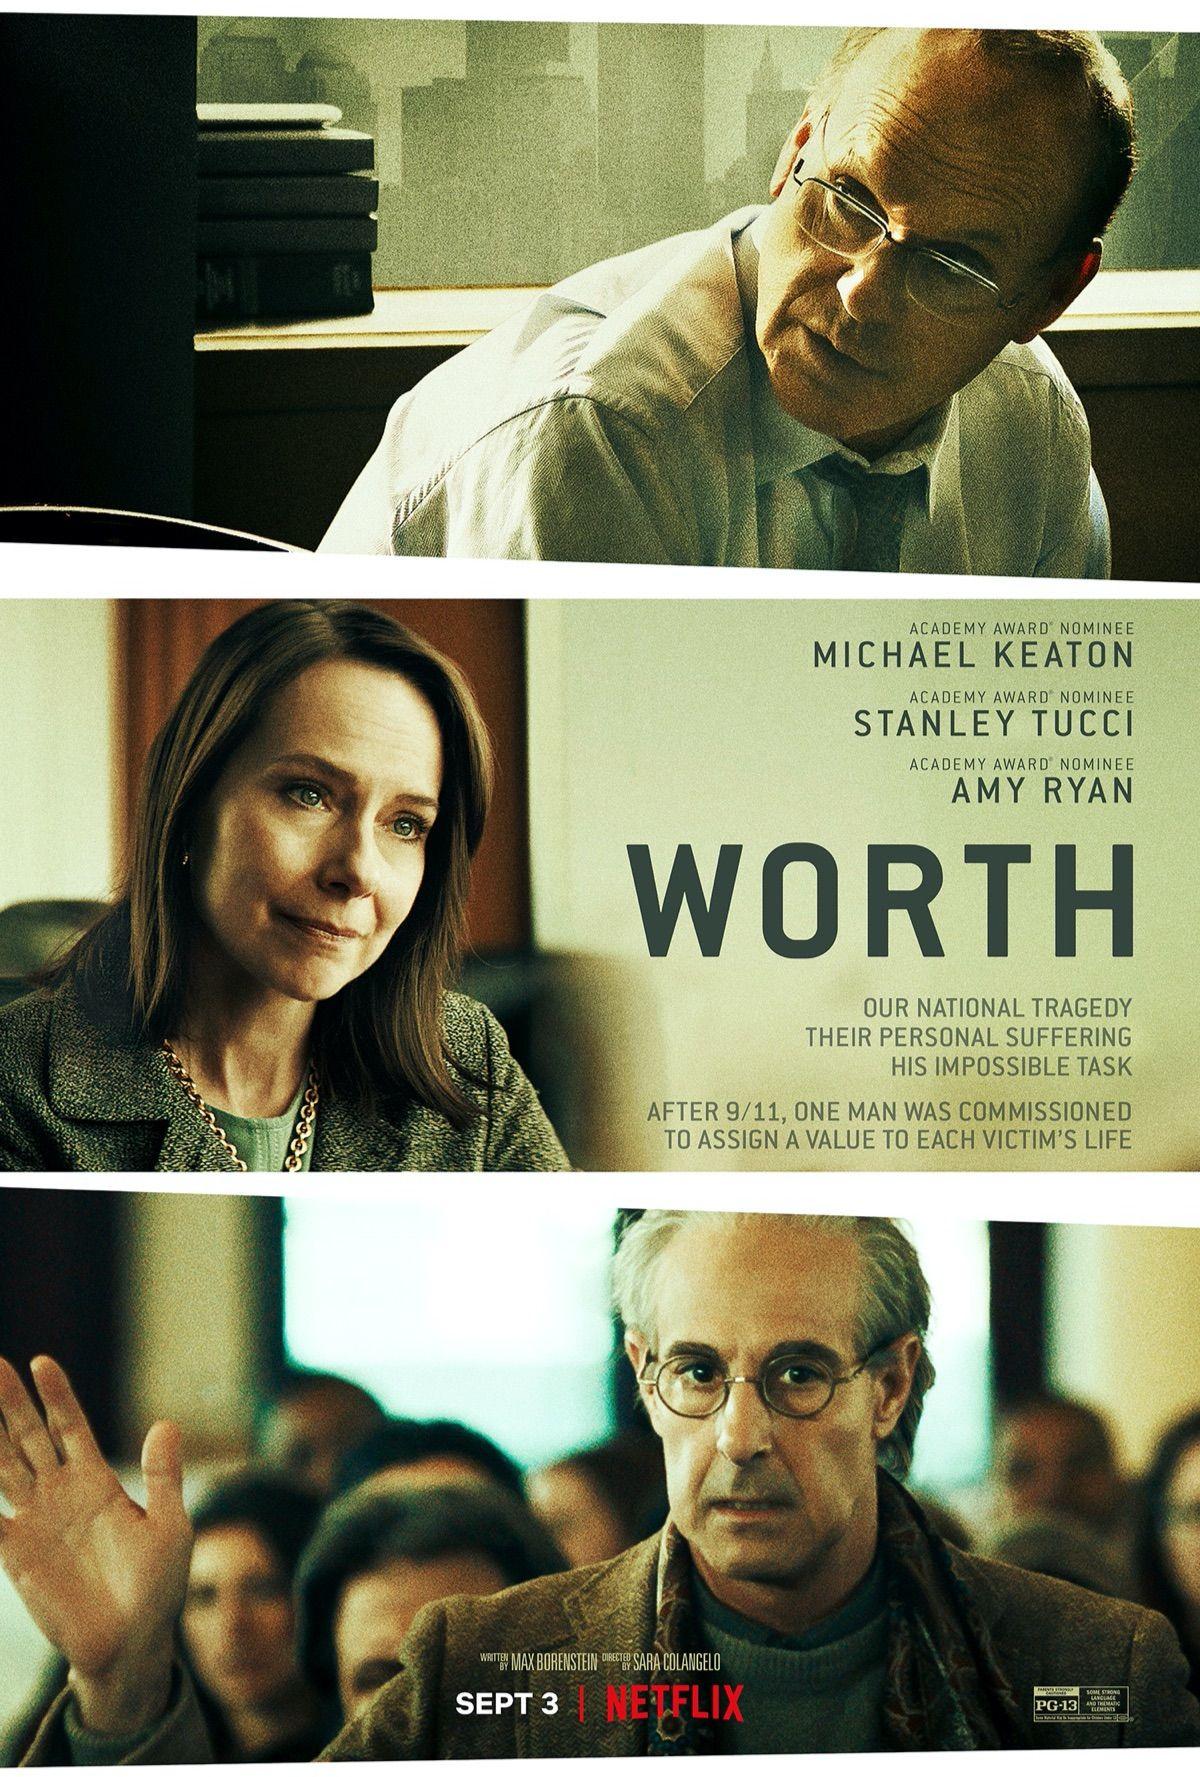 Worth Trailer & Poster